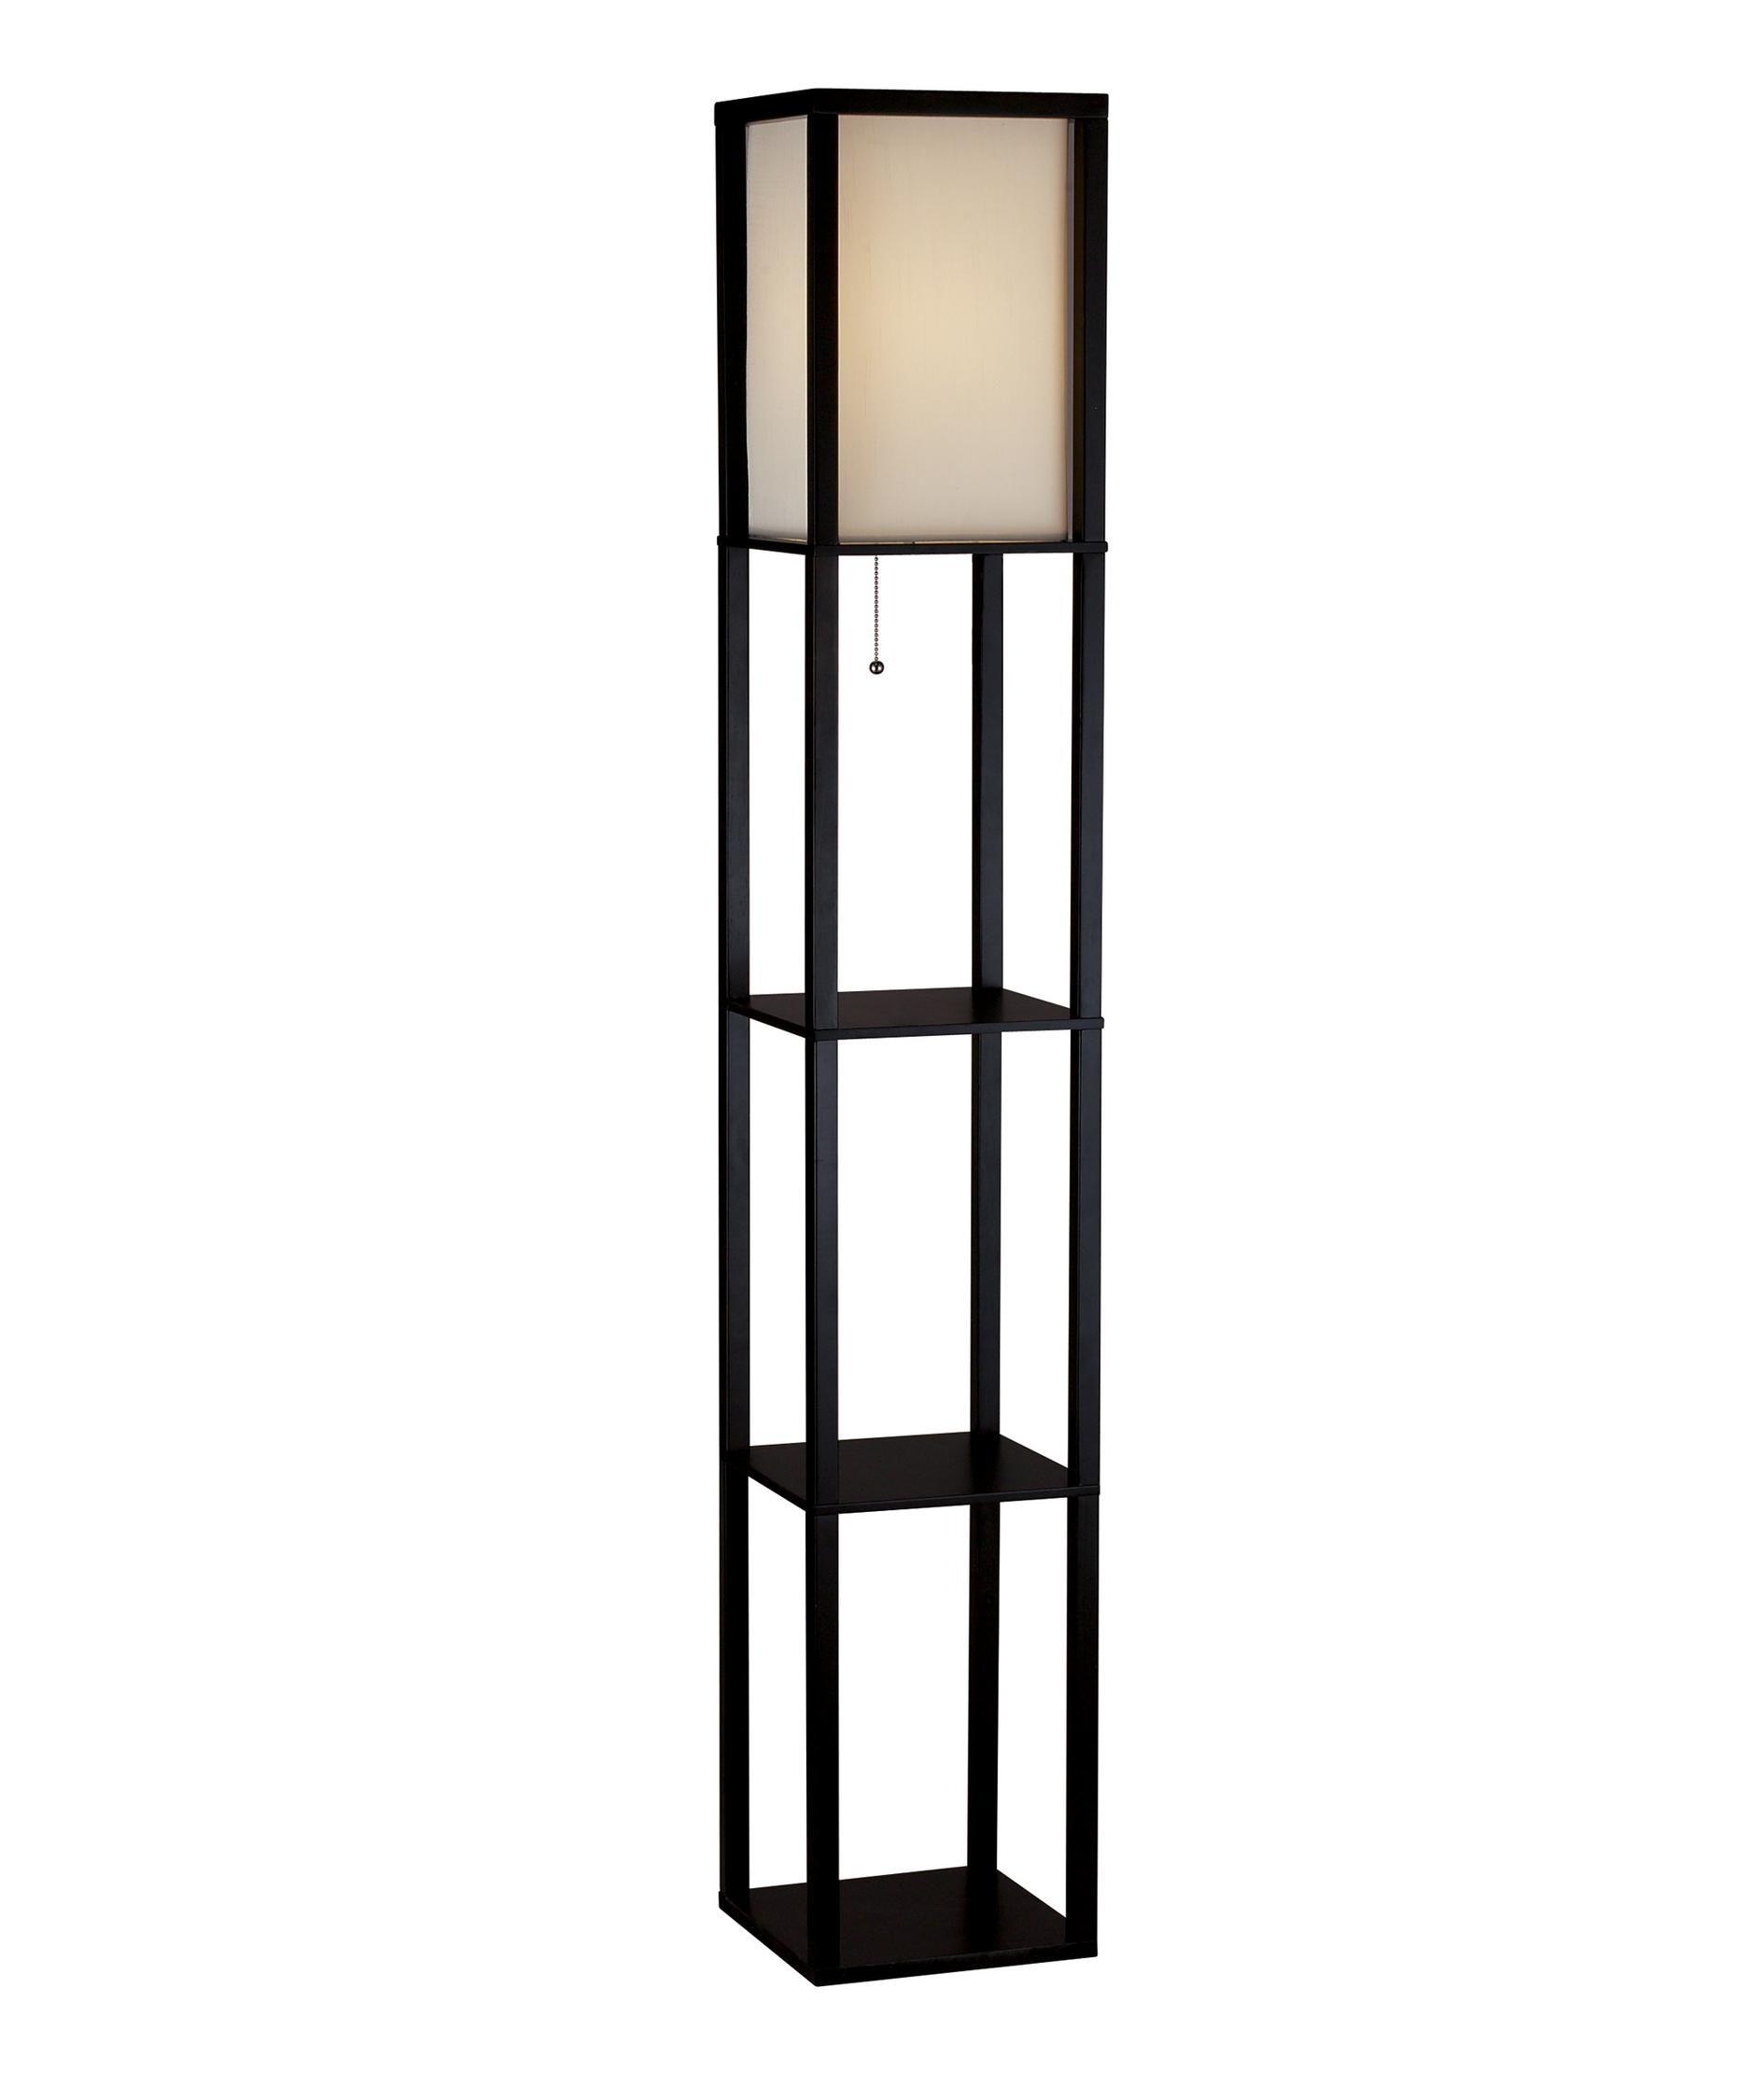 Wright 63 Inch Floor Lamp Capitol Lighting Square Floor Lamp Shelf Lamp Tall Floor Lamps